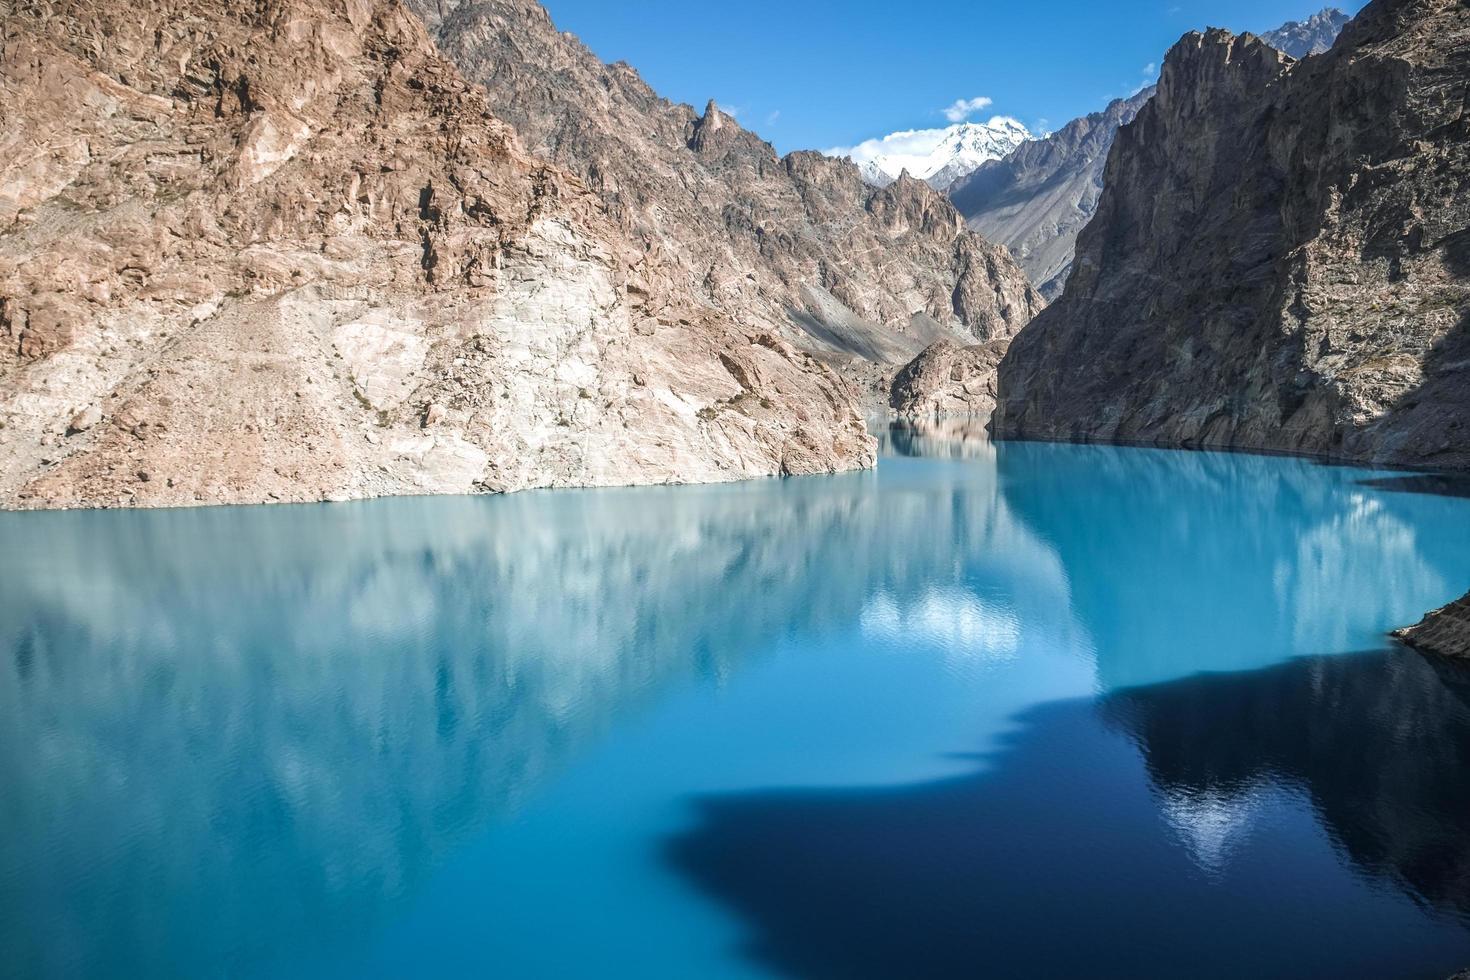 attabad meer in karakoram gebergte, pakistan foto